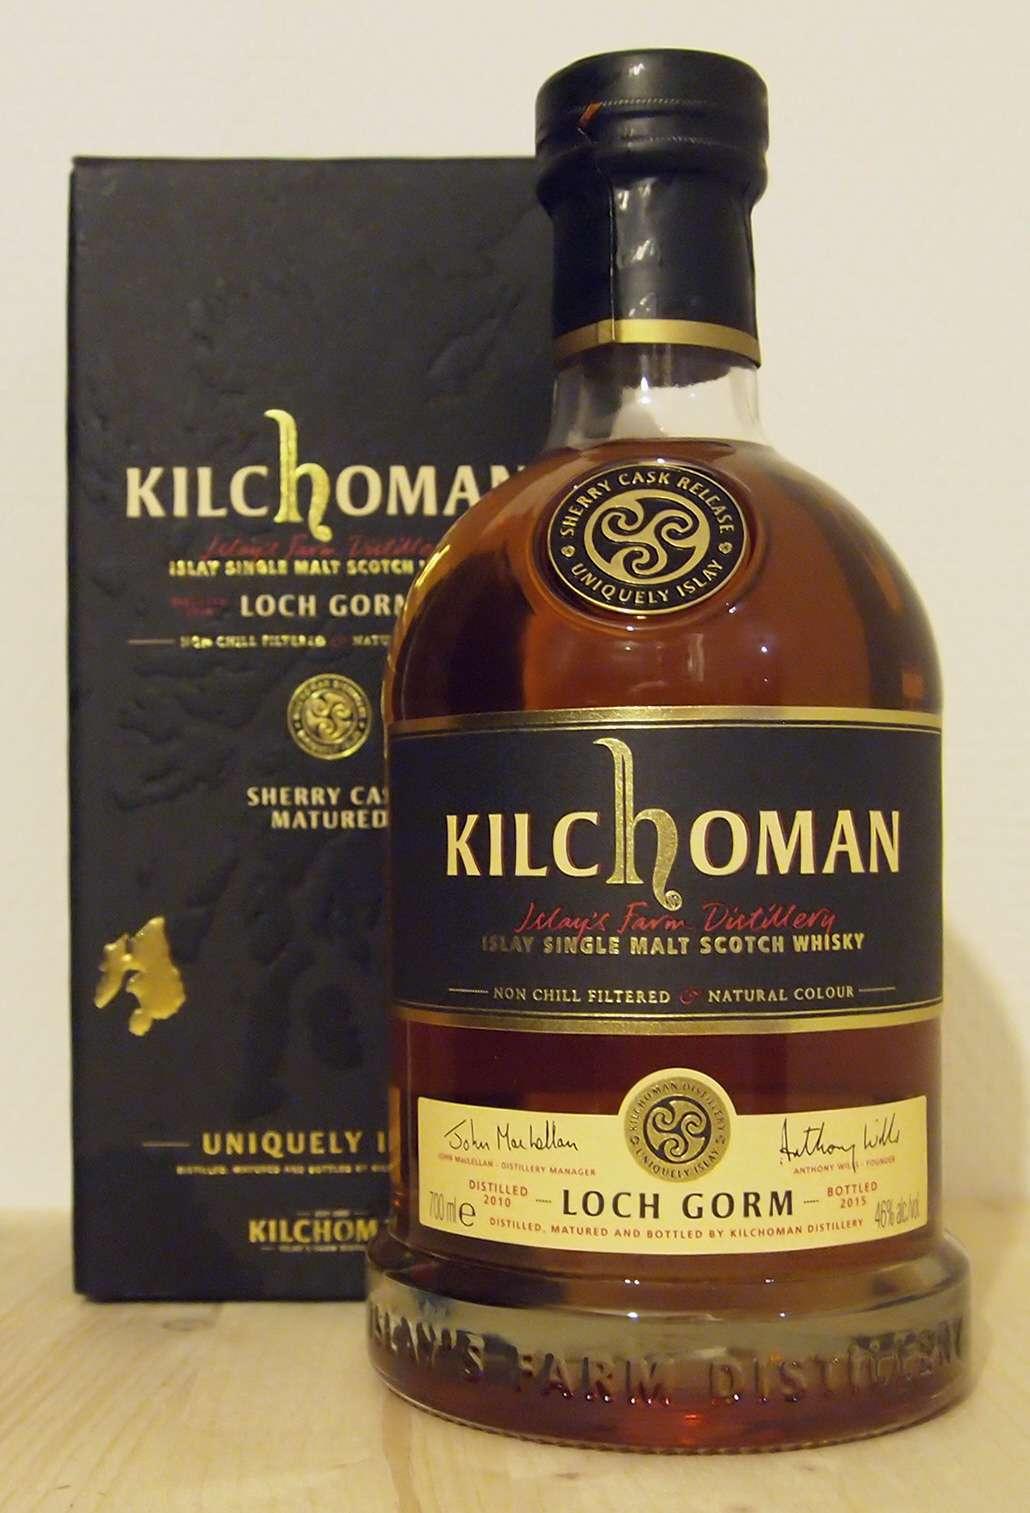 Single Malt Whisky Kilchoman Loch Gorm, 2015